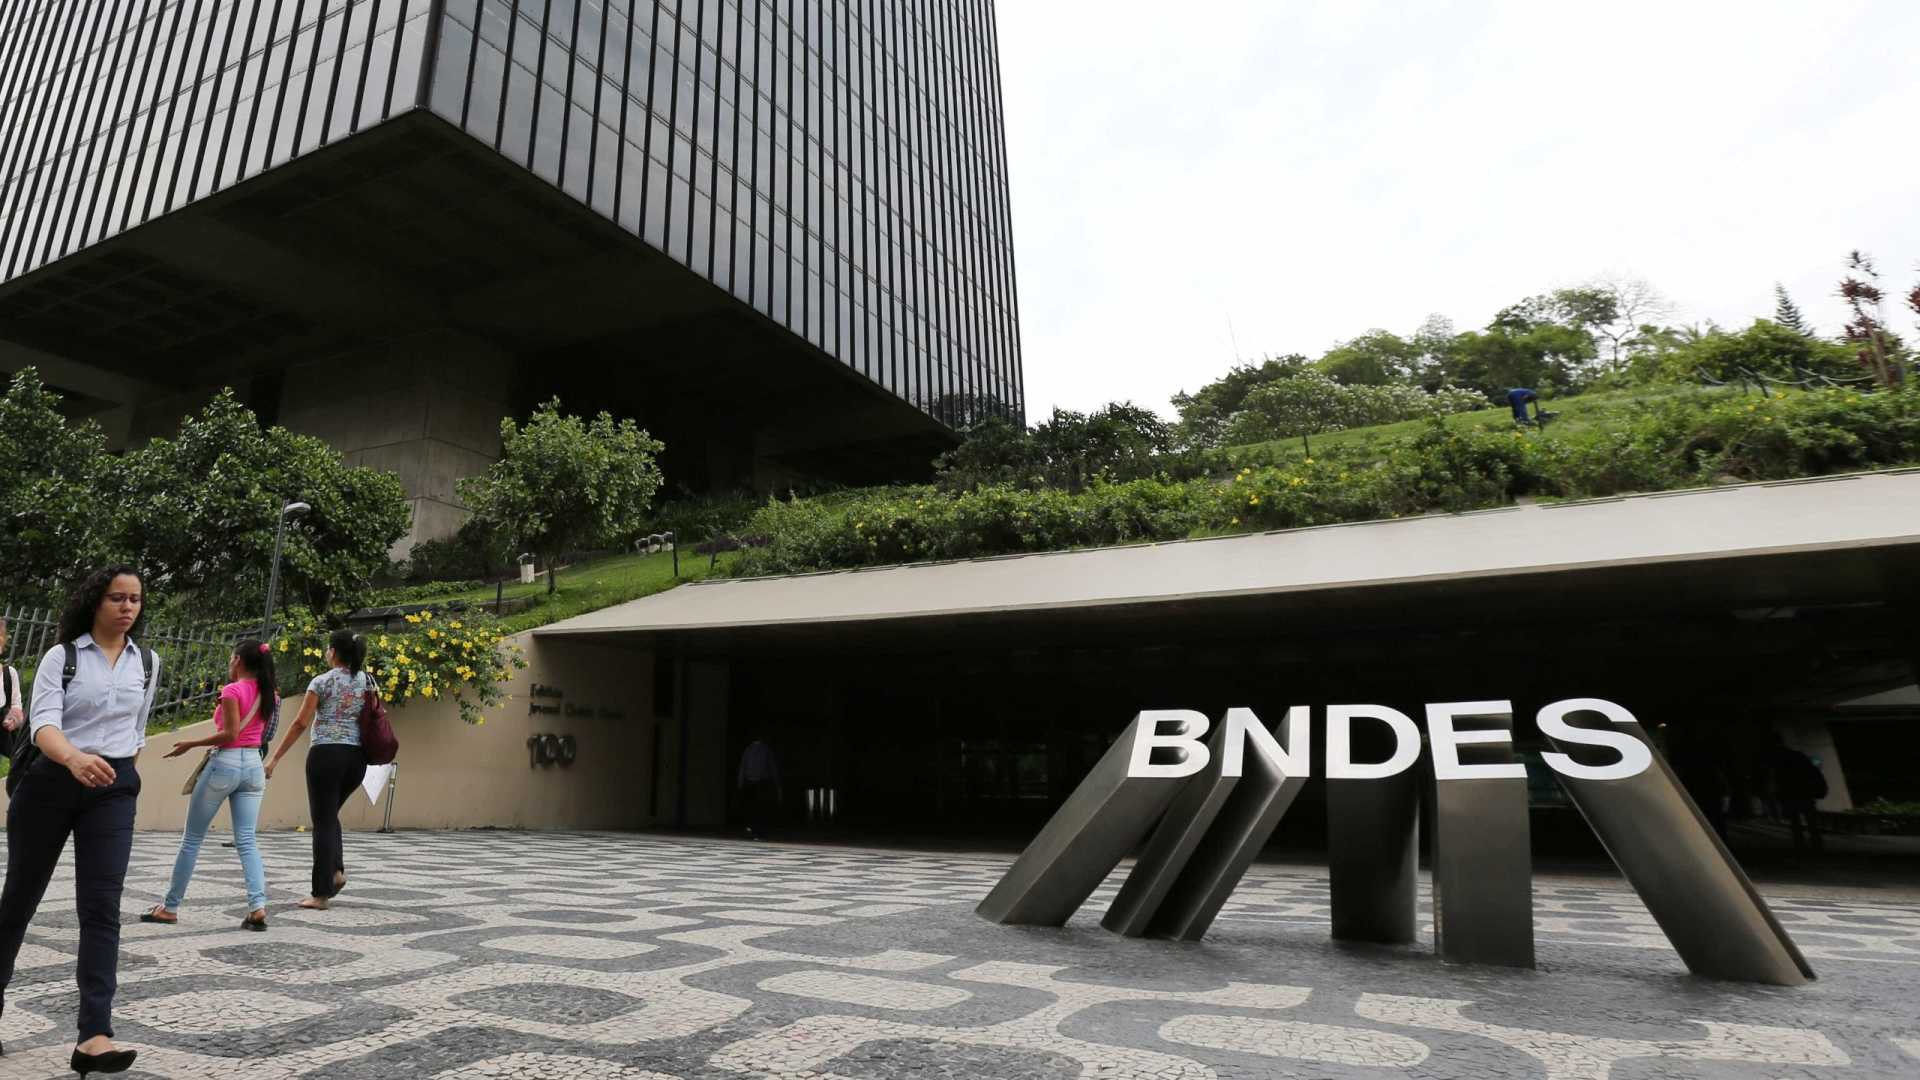 BNDES_FRENTE